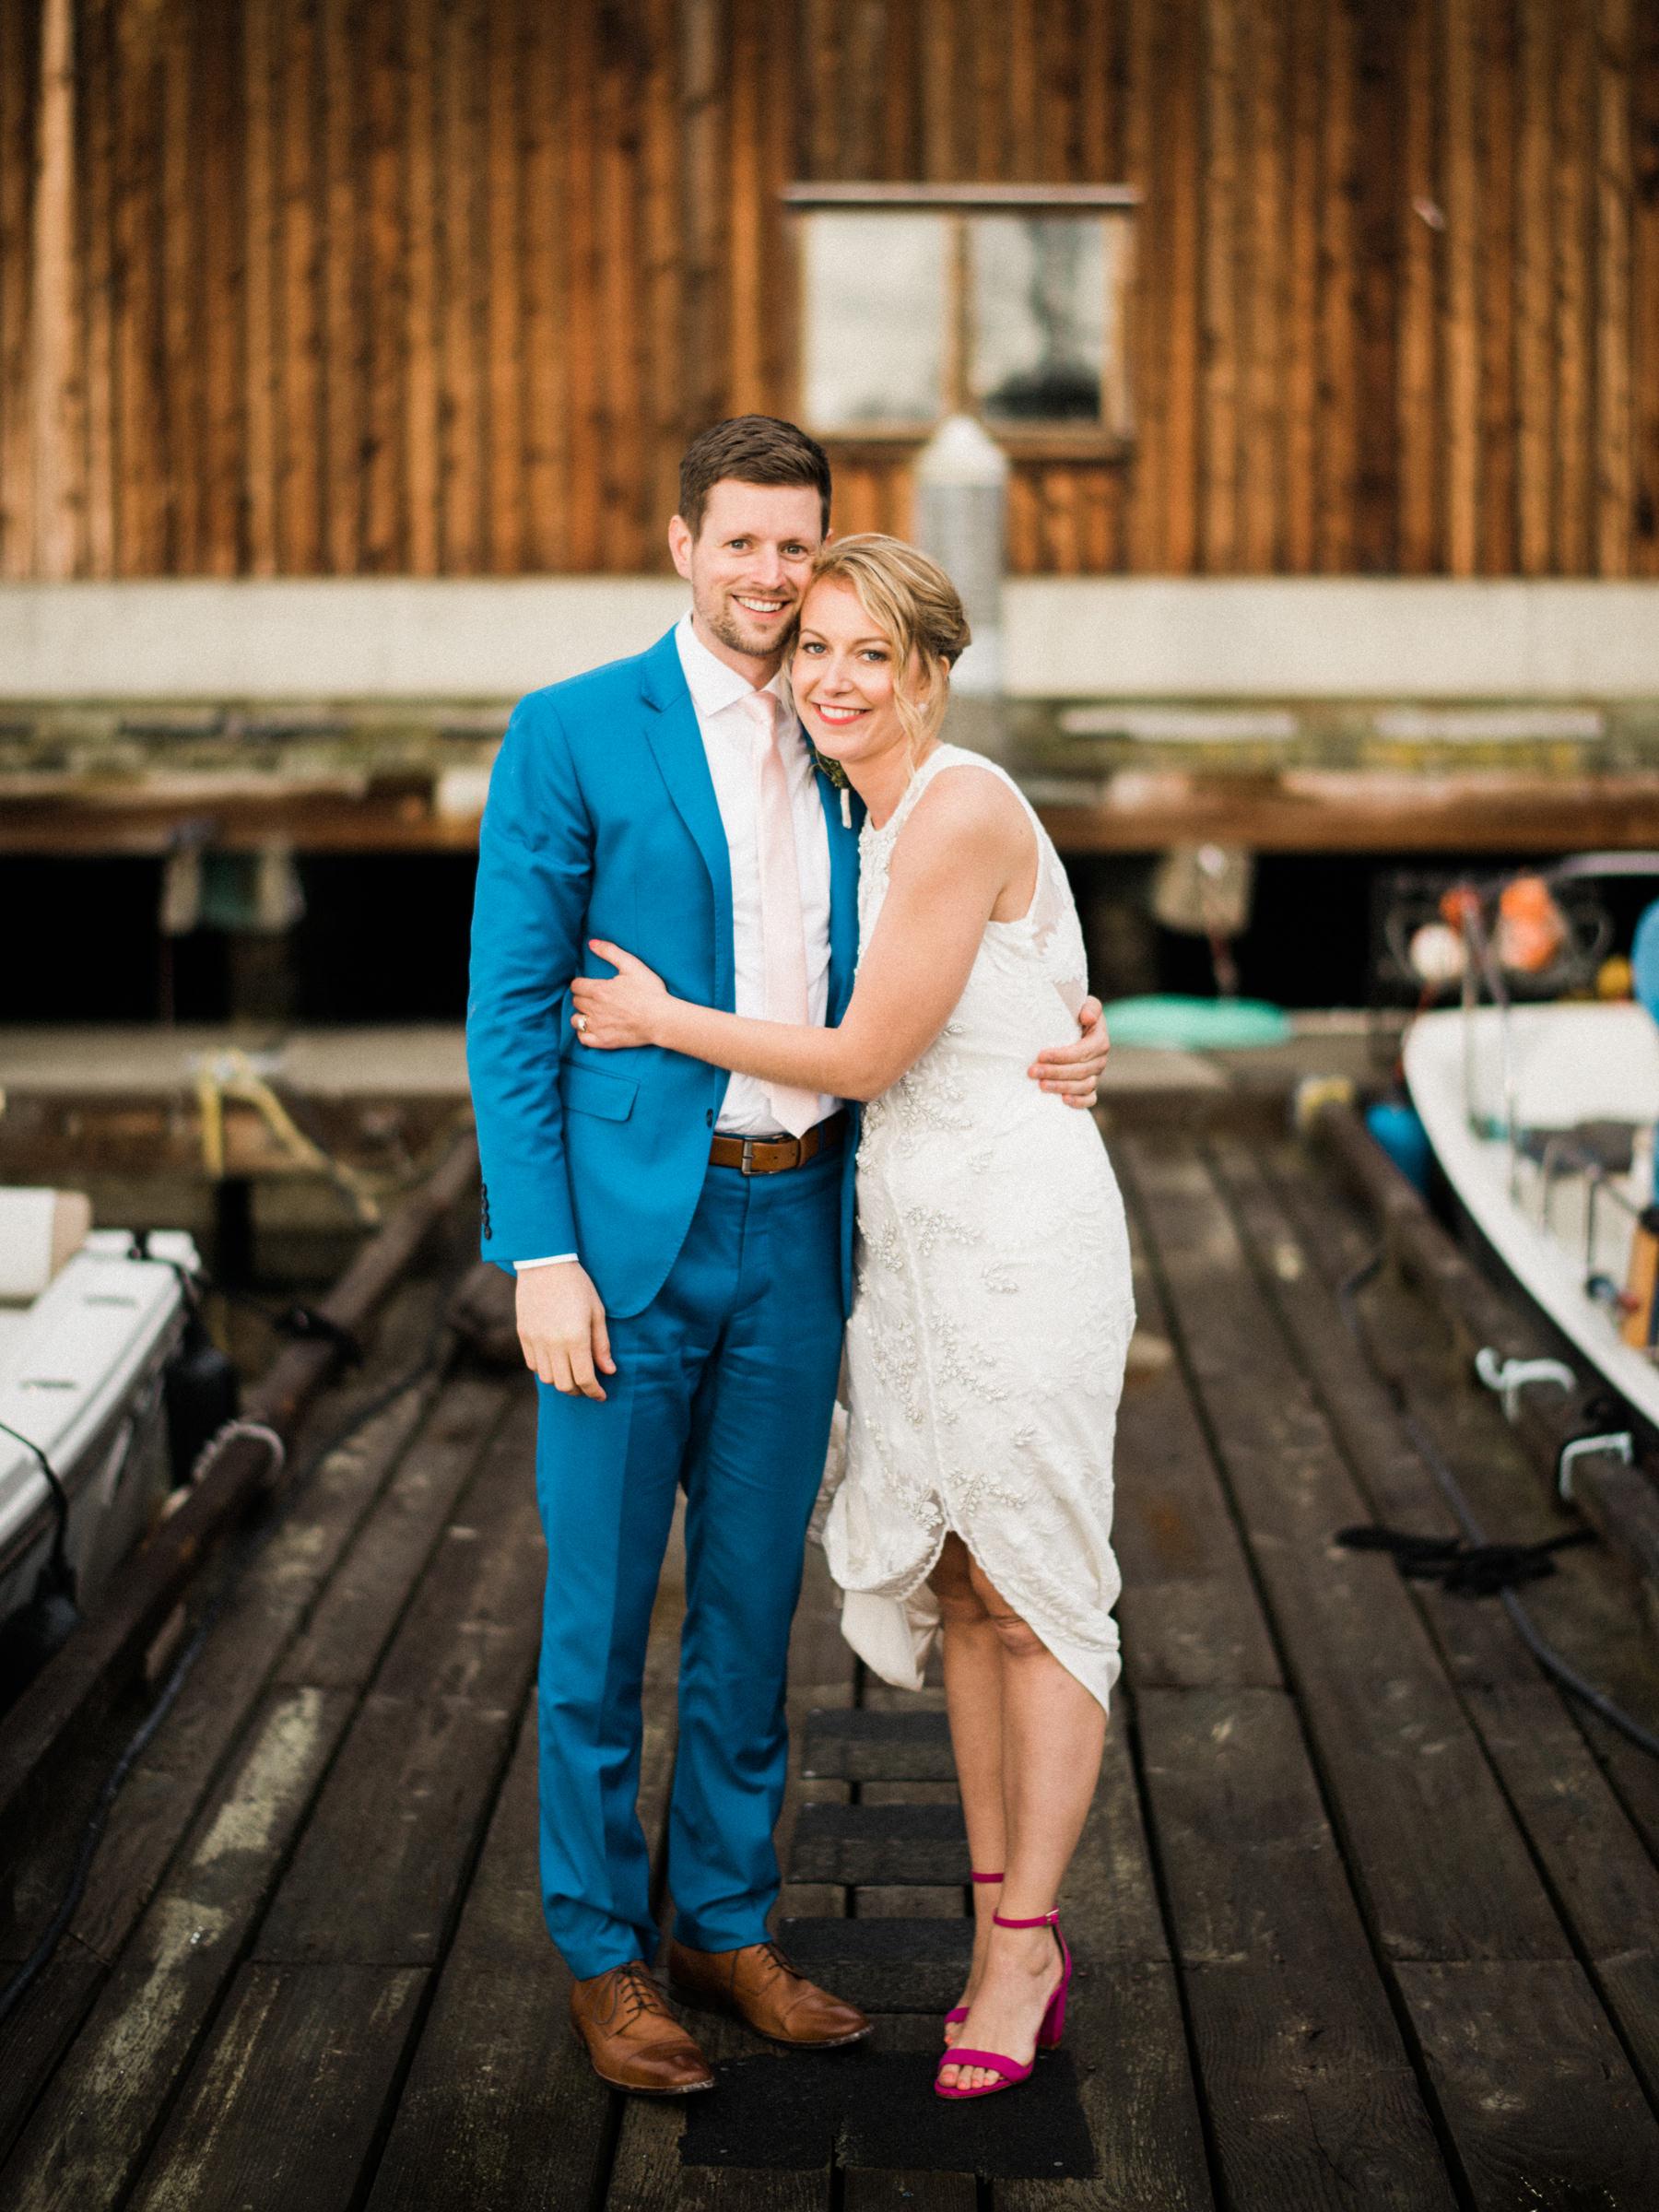 344-colorful-outdoor-lopez-island-wedding.jpg